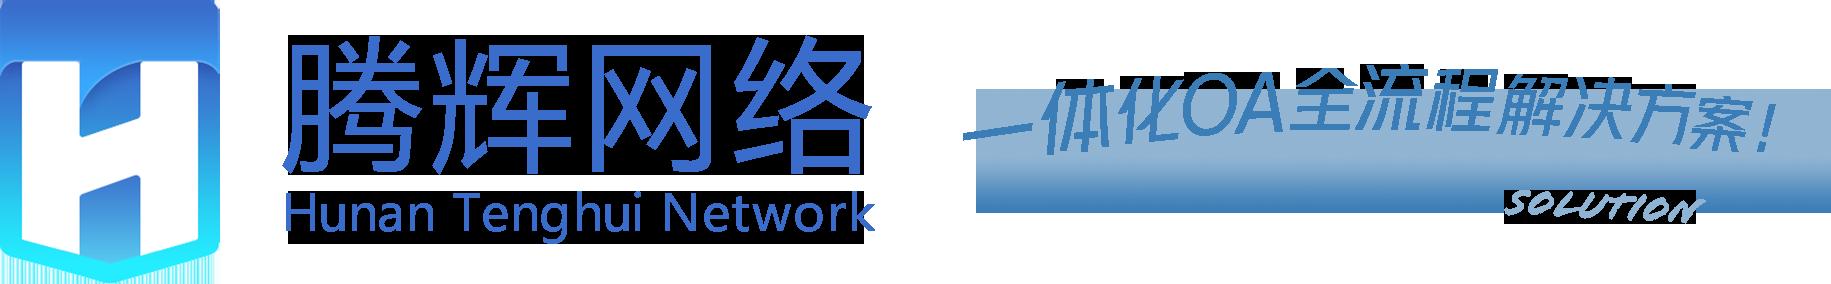 OA办公软件_CRM客户管理_ERP系统_企业微信_企管精灵|湖南长沙腾辉网络